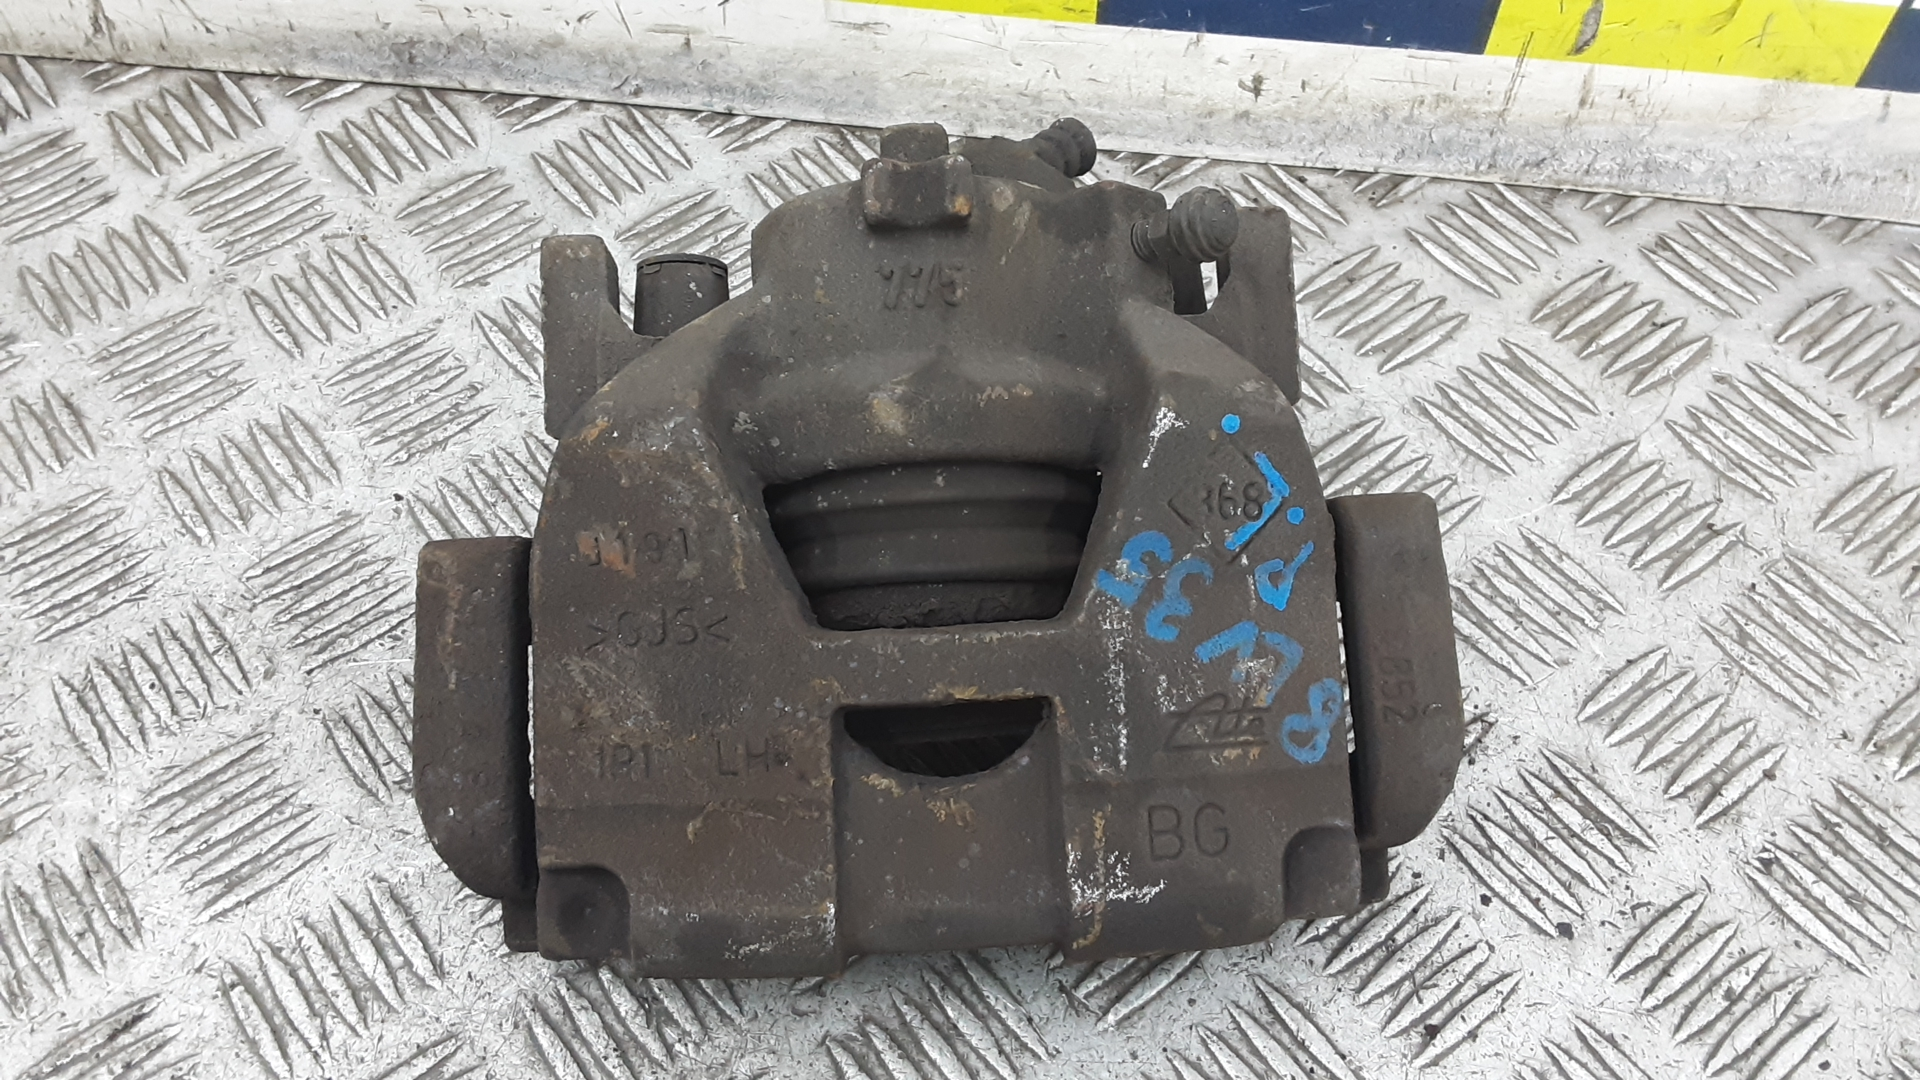 Суппорт тормозной передний левый, RENAULT, SCENIC 3 GRAND SCENIC, 2009